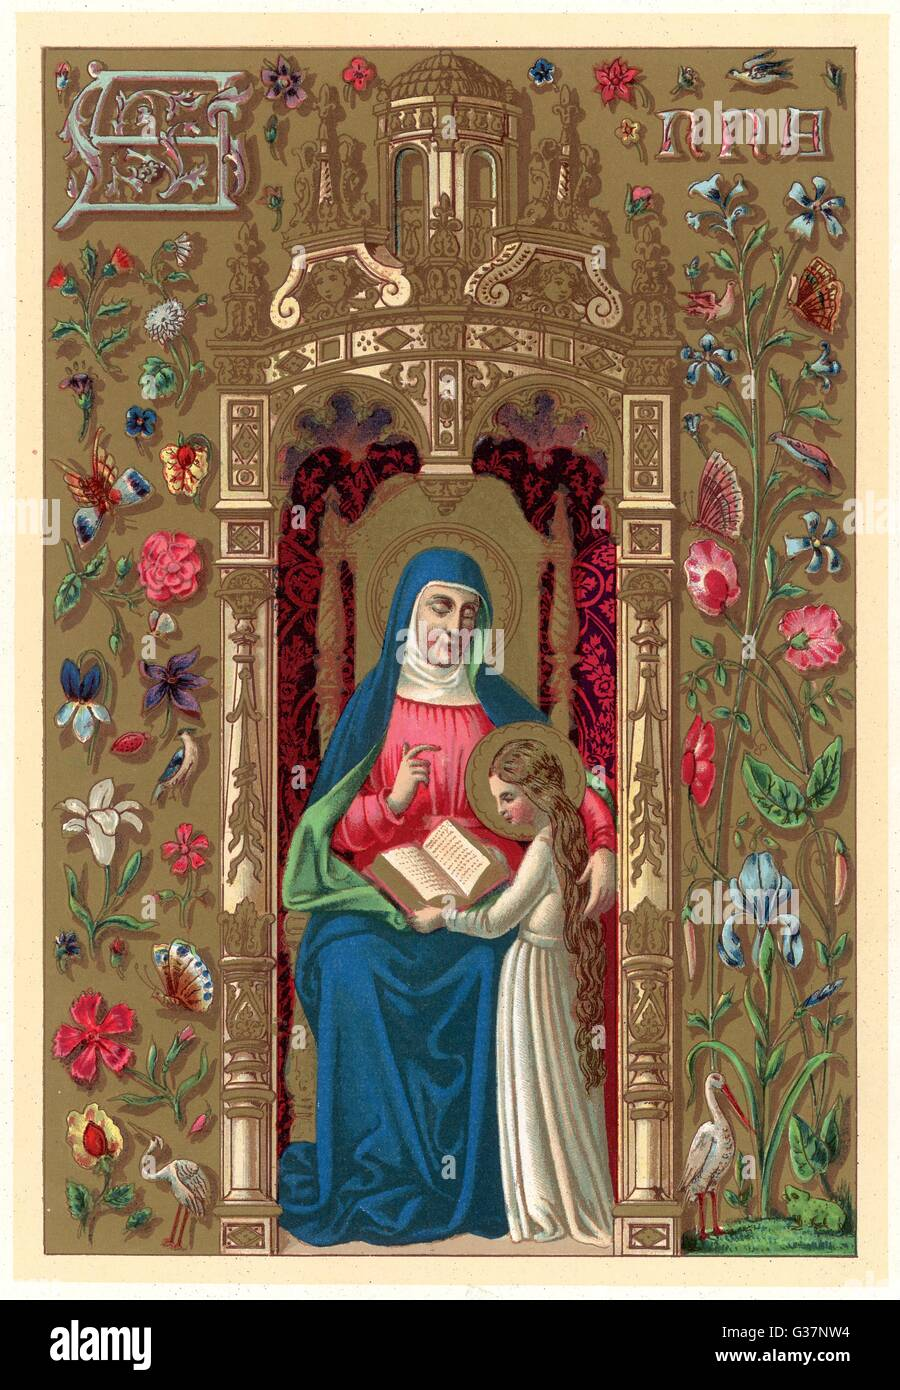 Saint Anne - Stock Image